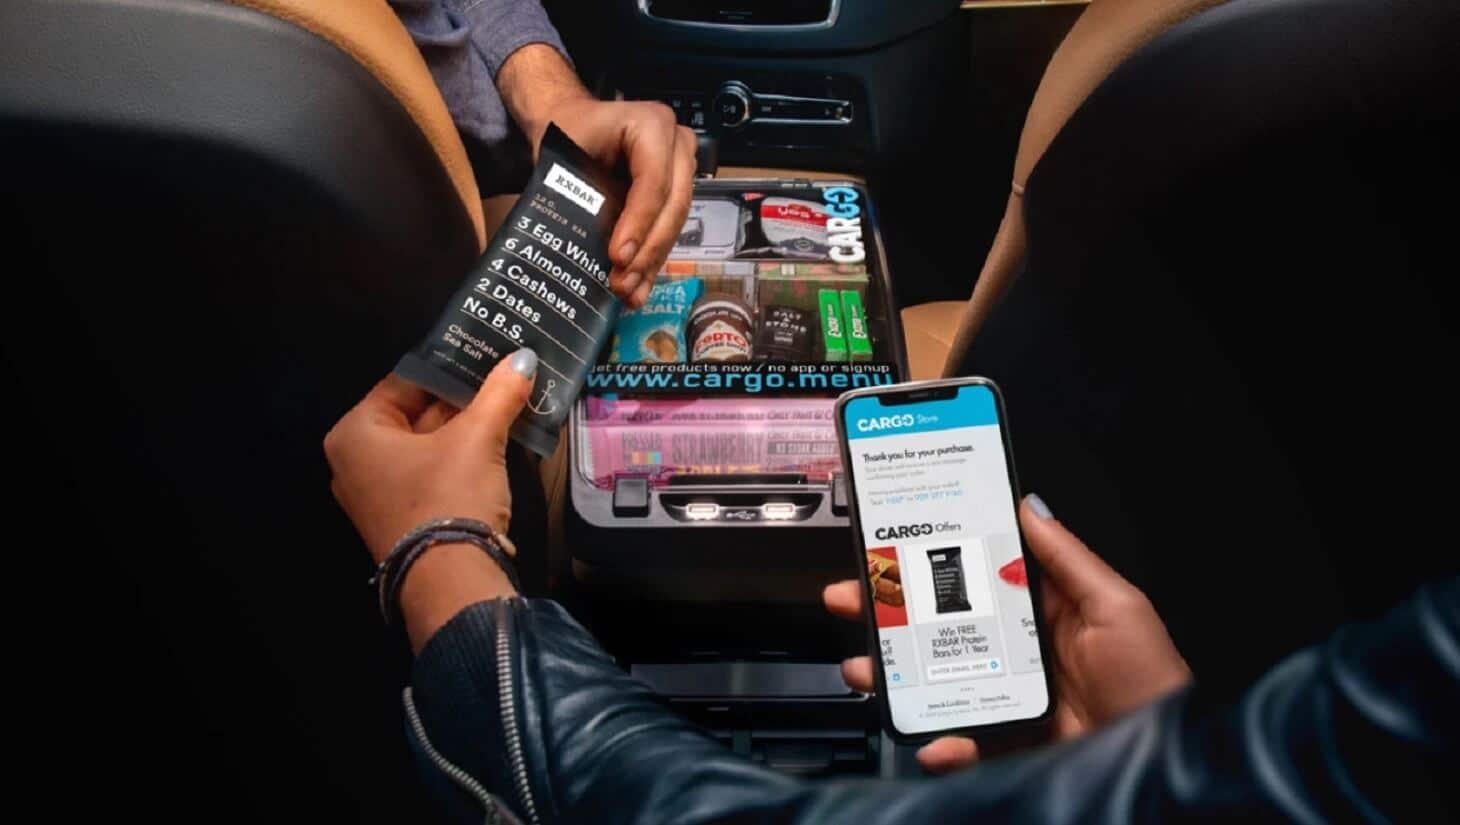 cargo uber partnership